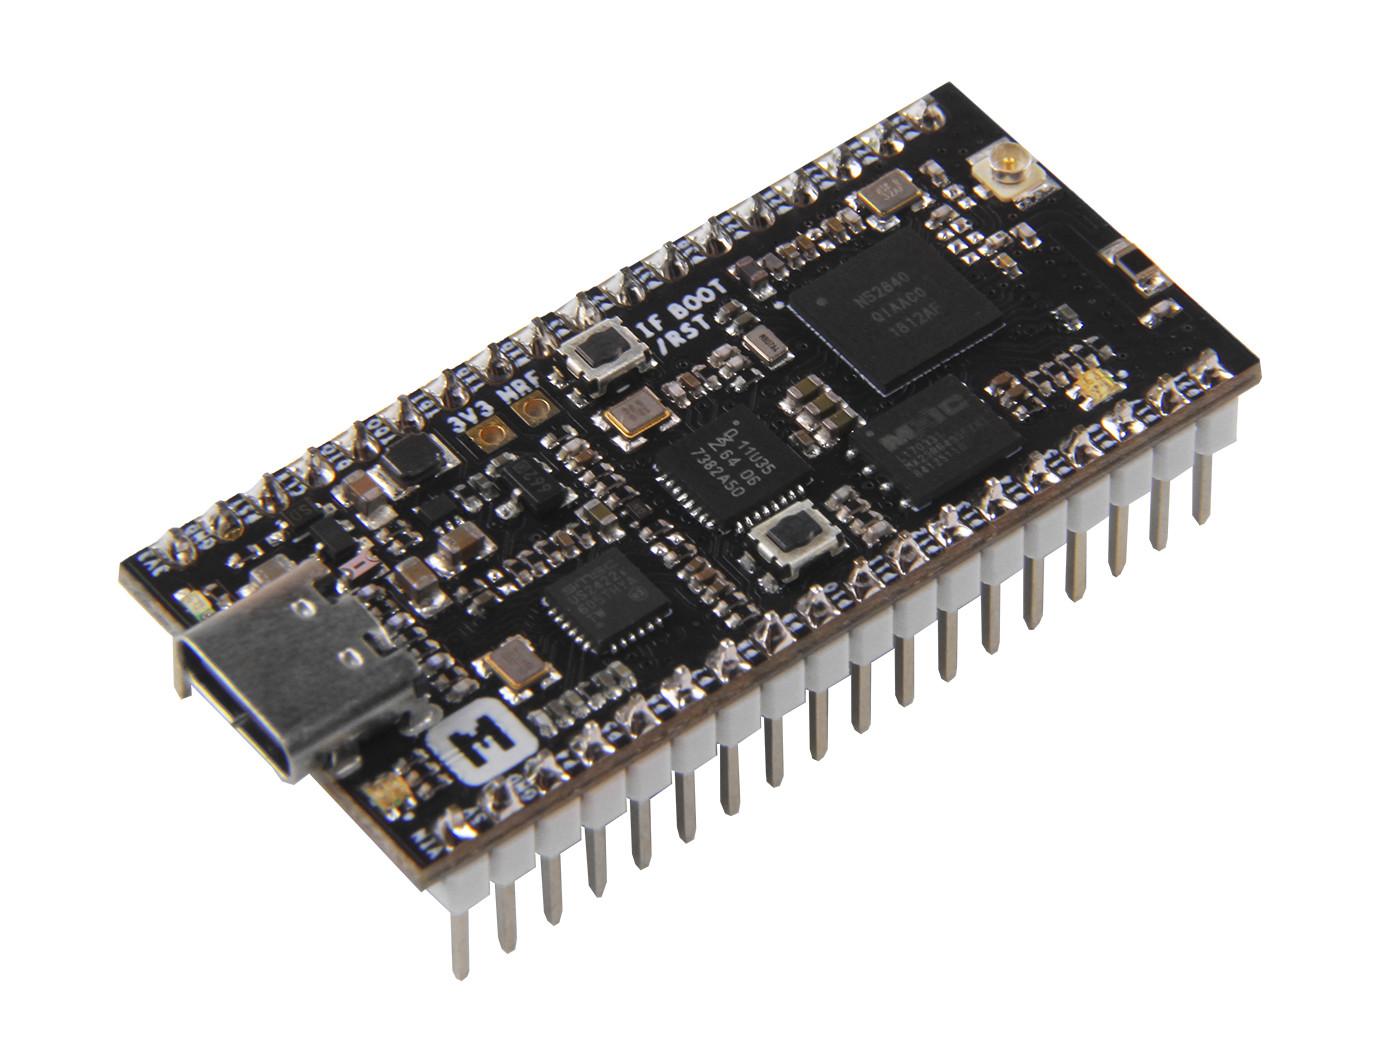 Makerdiary nRF52840 Micro Development Kit Works with OpenThread, Arm